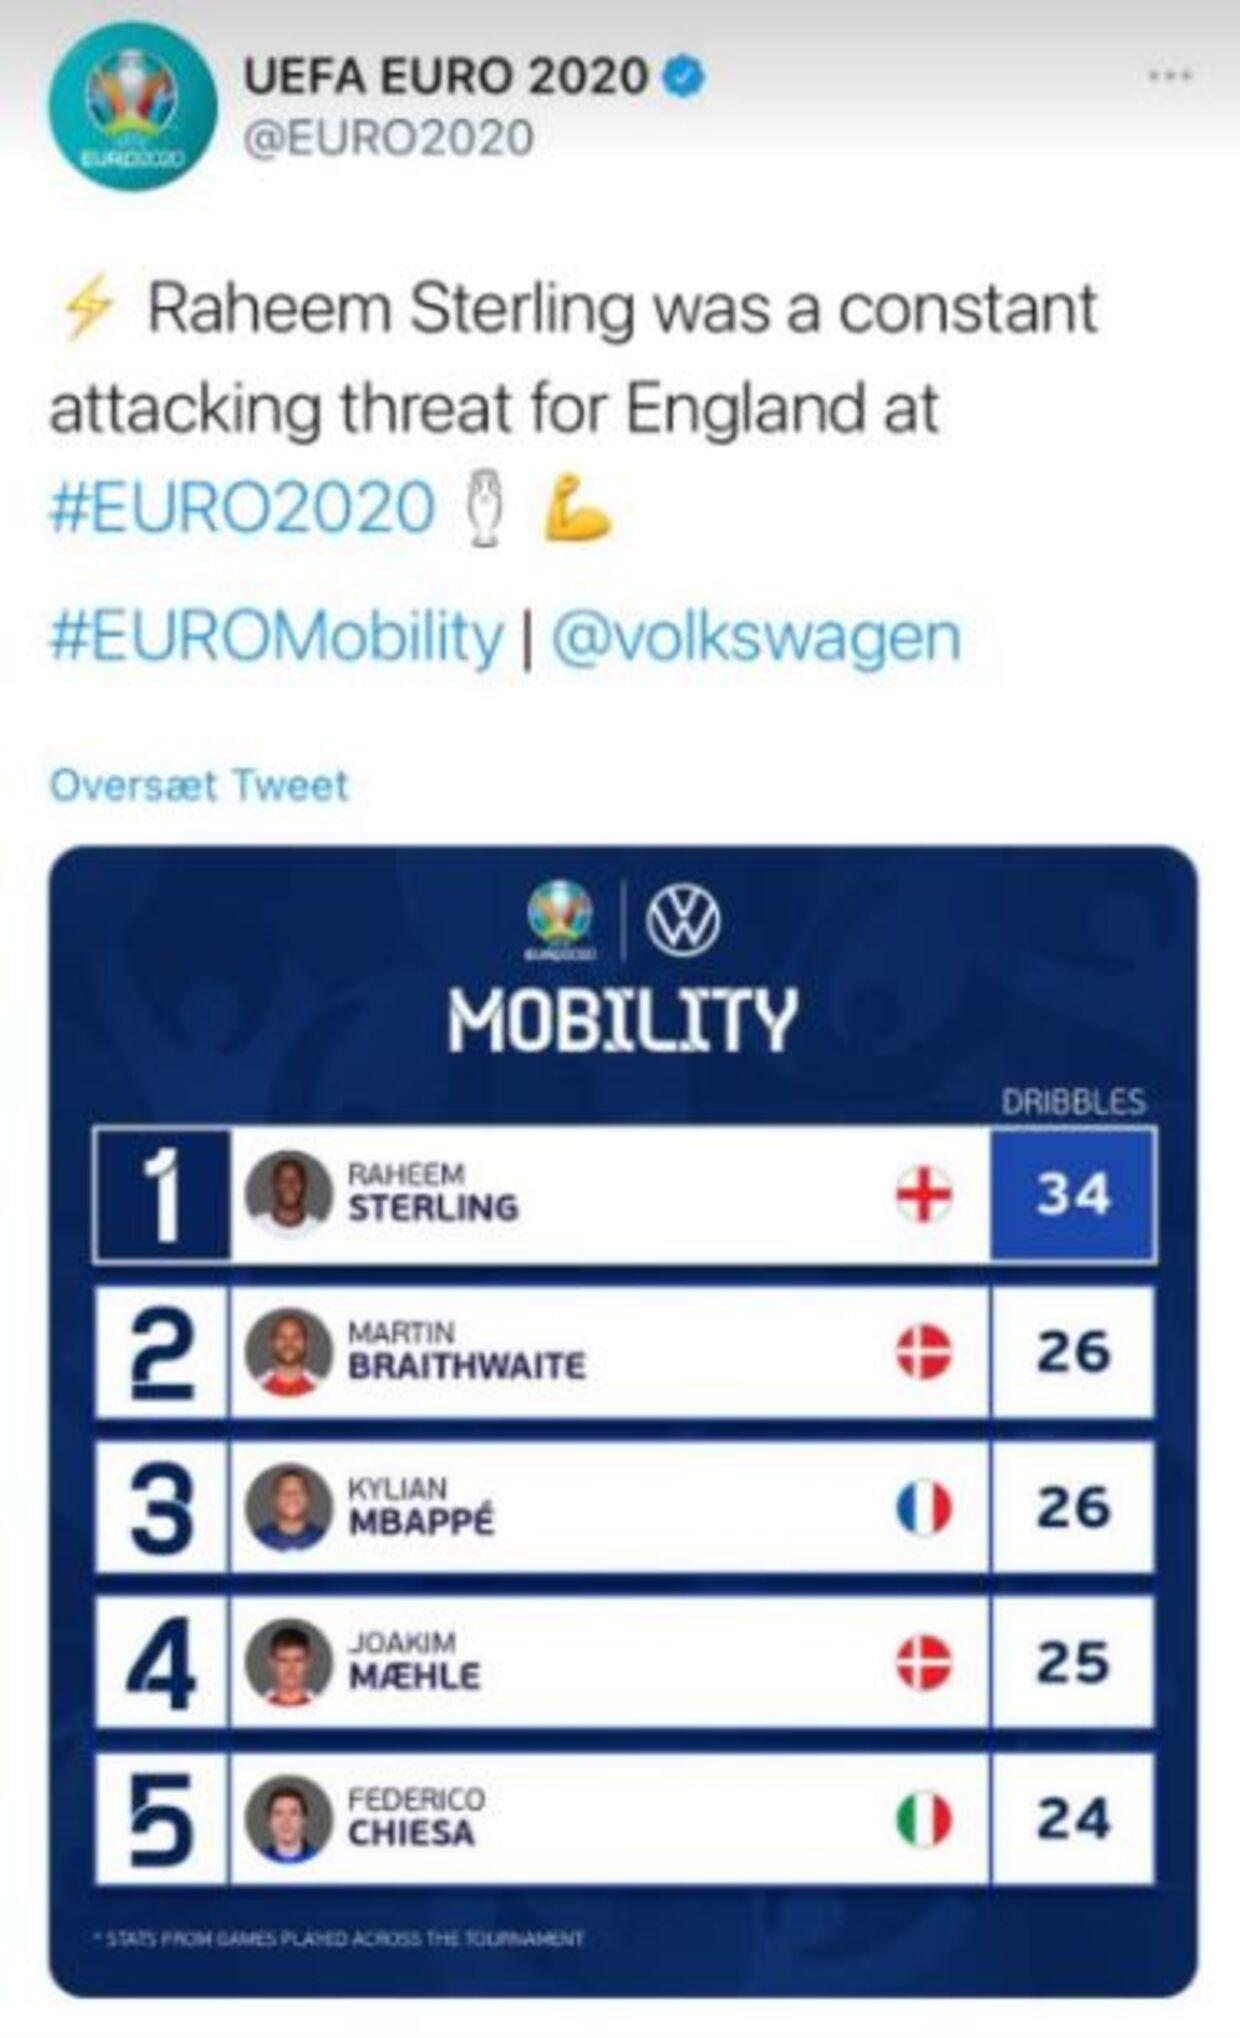 UEFA har registreret Martin Braithwaite til at være den næstmest vellykkede spiller i driblinger ved EM.